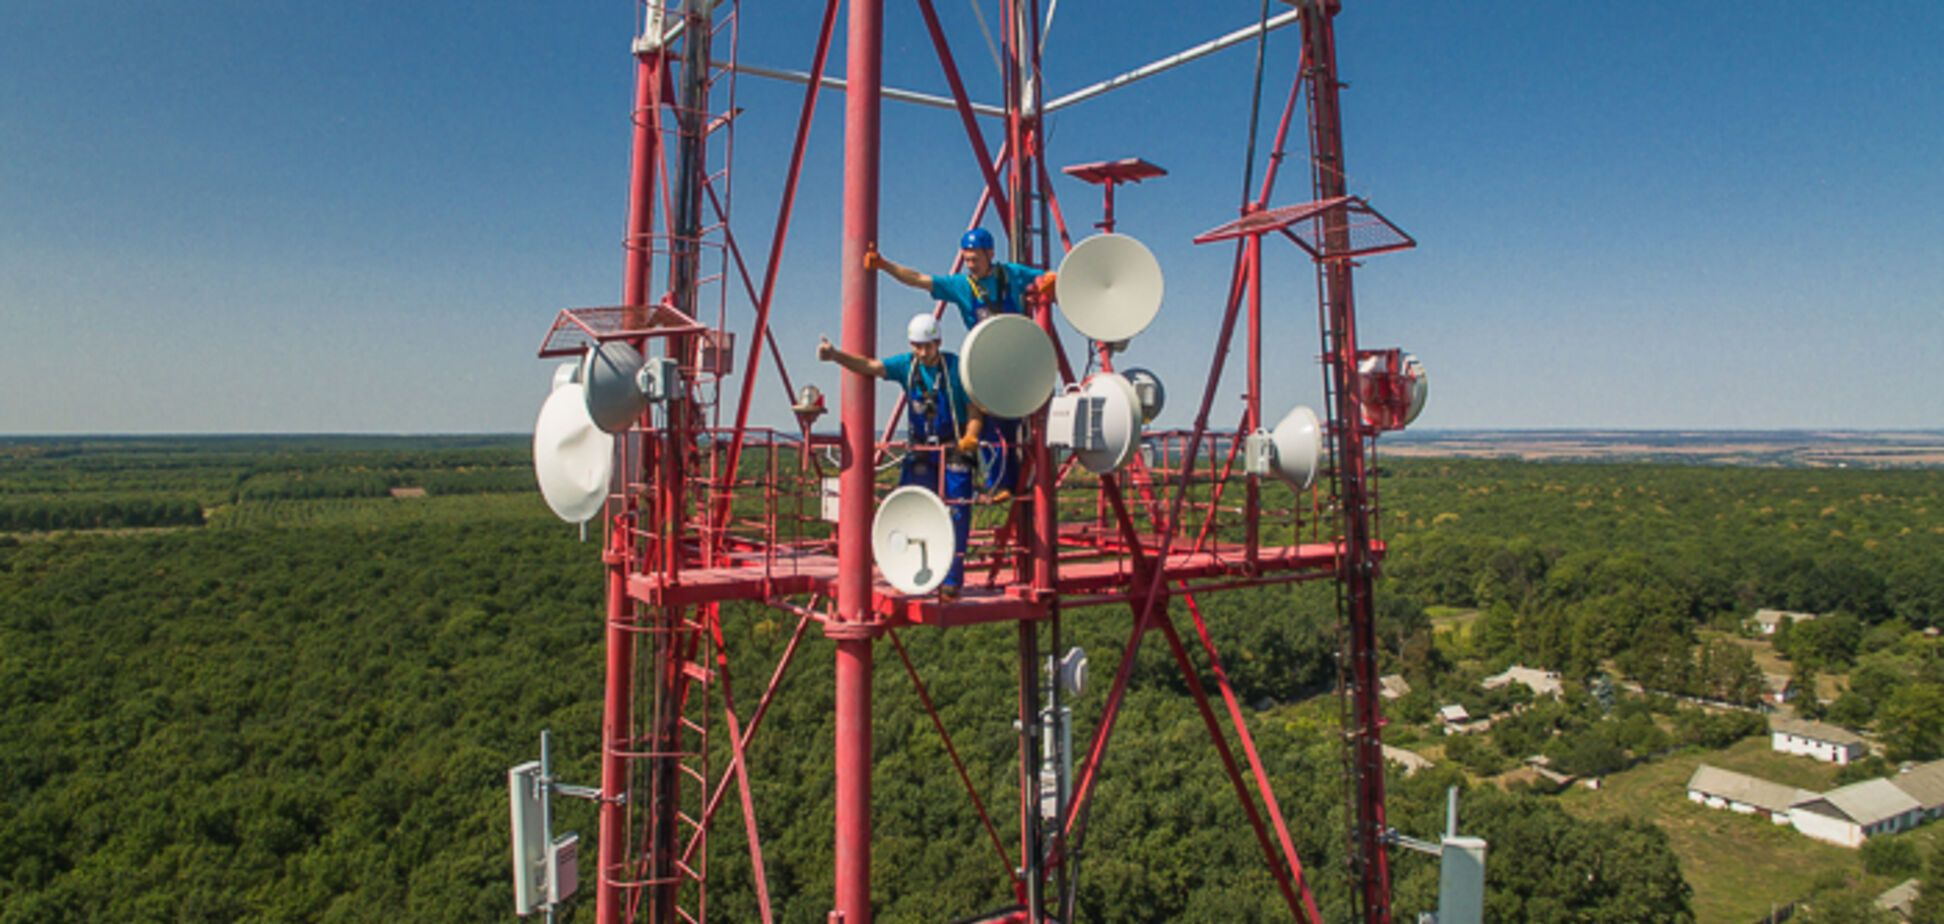 'Київстар' запустив 4G на частотах 900 МГц у всіх областях України